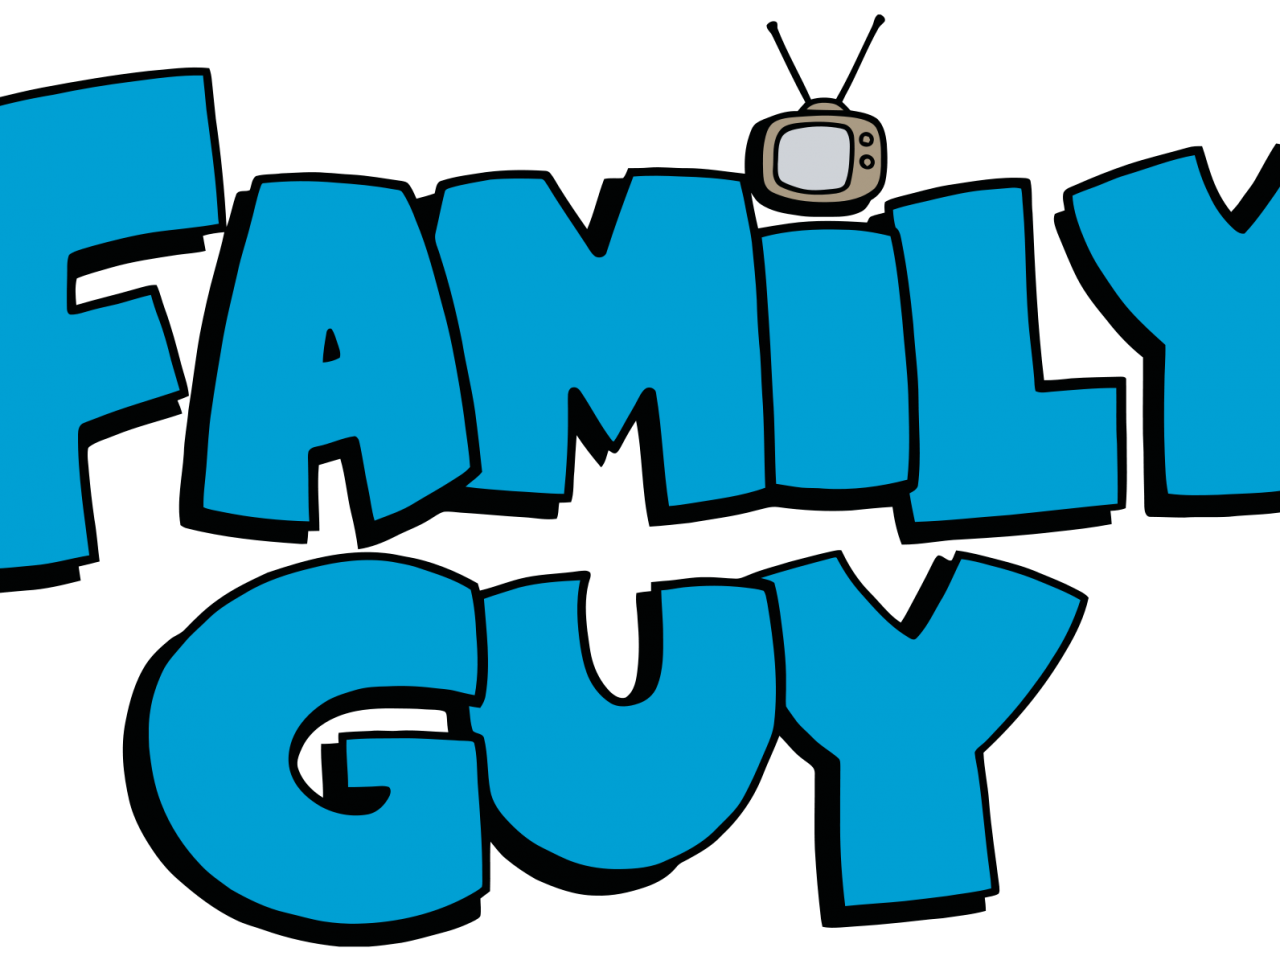 Hd Family Guy Wallpaper Hd Wallpapers